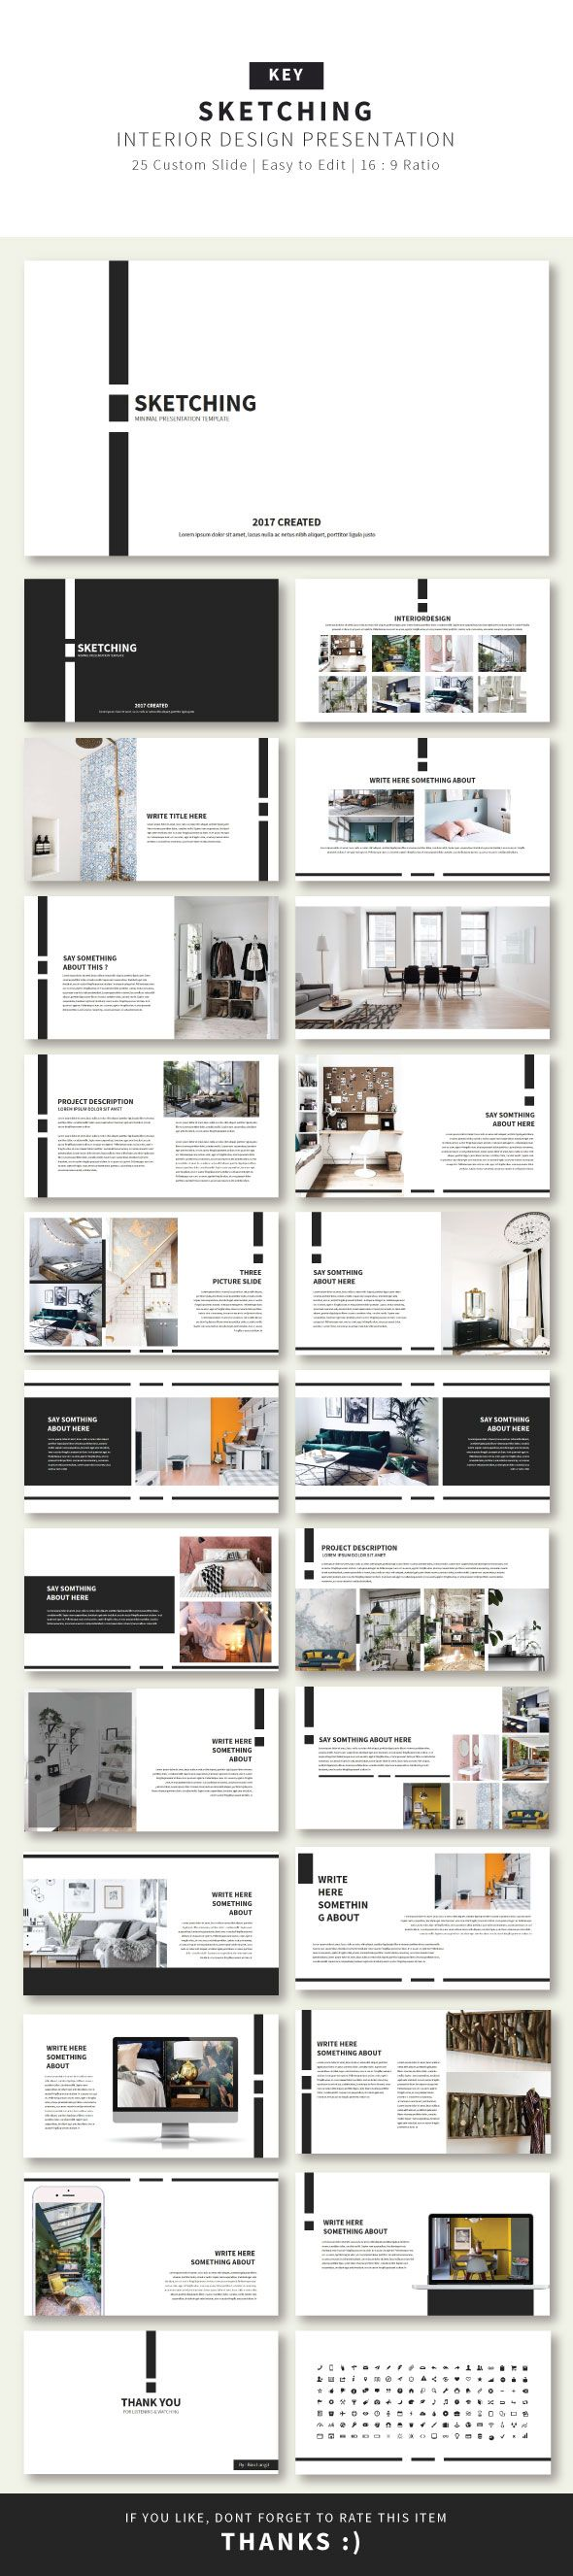 sketching presentation keynote template business keynote templates dise o pinterest. Black Bedroom Furniture Sets. Home Design Ideas